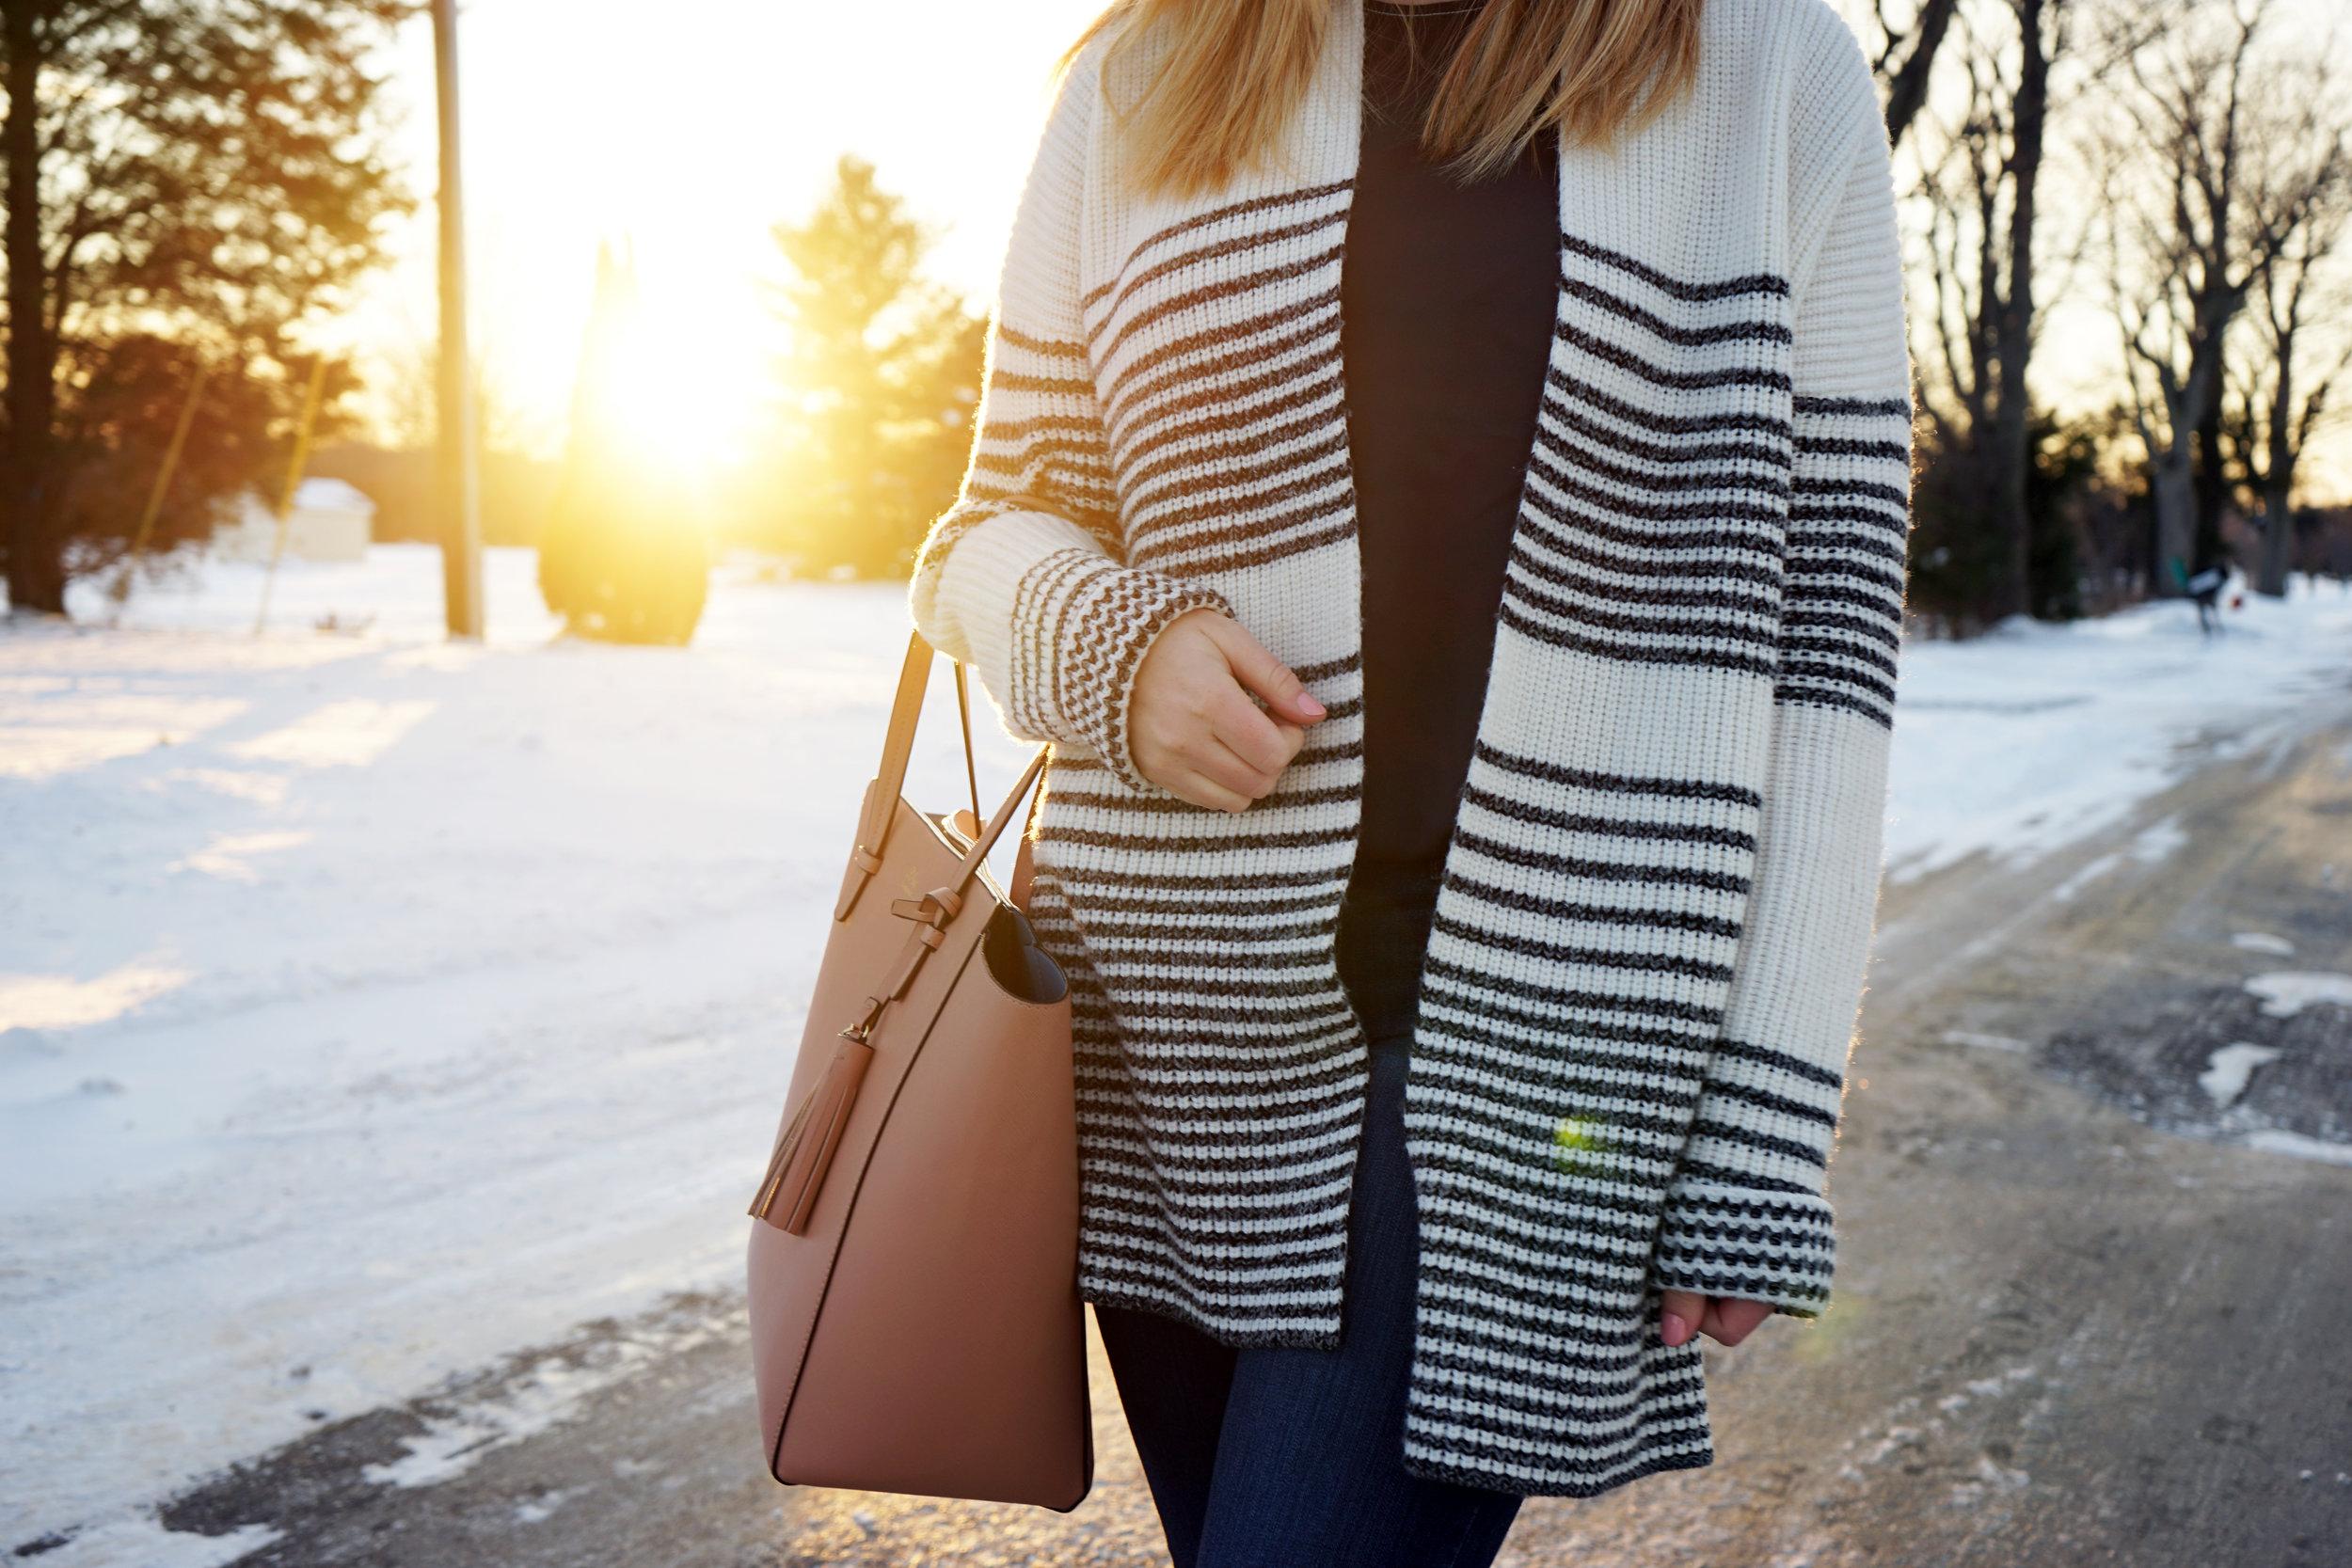 Maggie a la Mode - Gap Merino Wool Blend Gradient Stripe Shaker Cardigan, Theory Melana Modern Georgette Silk Top, Blue Les Copains Tote